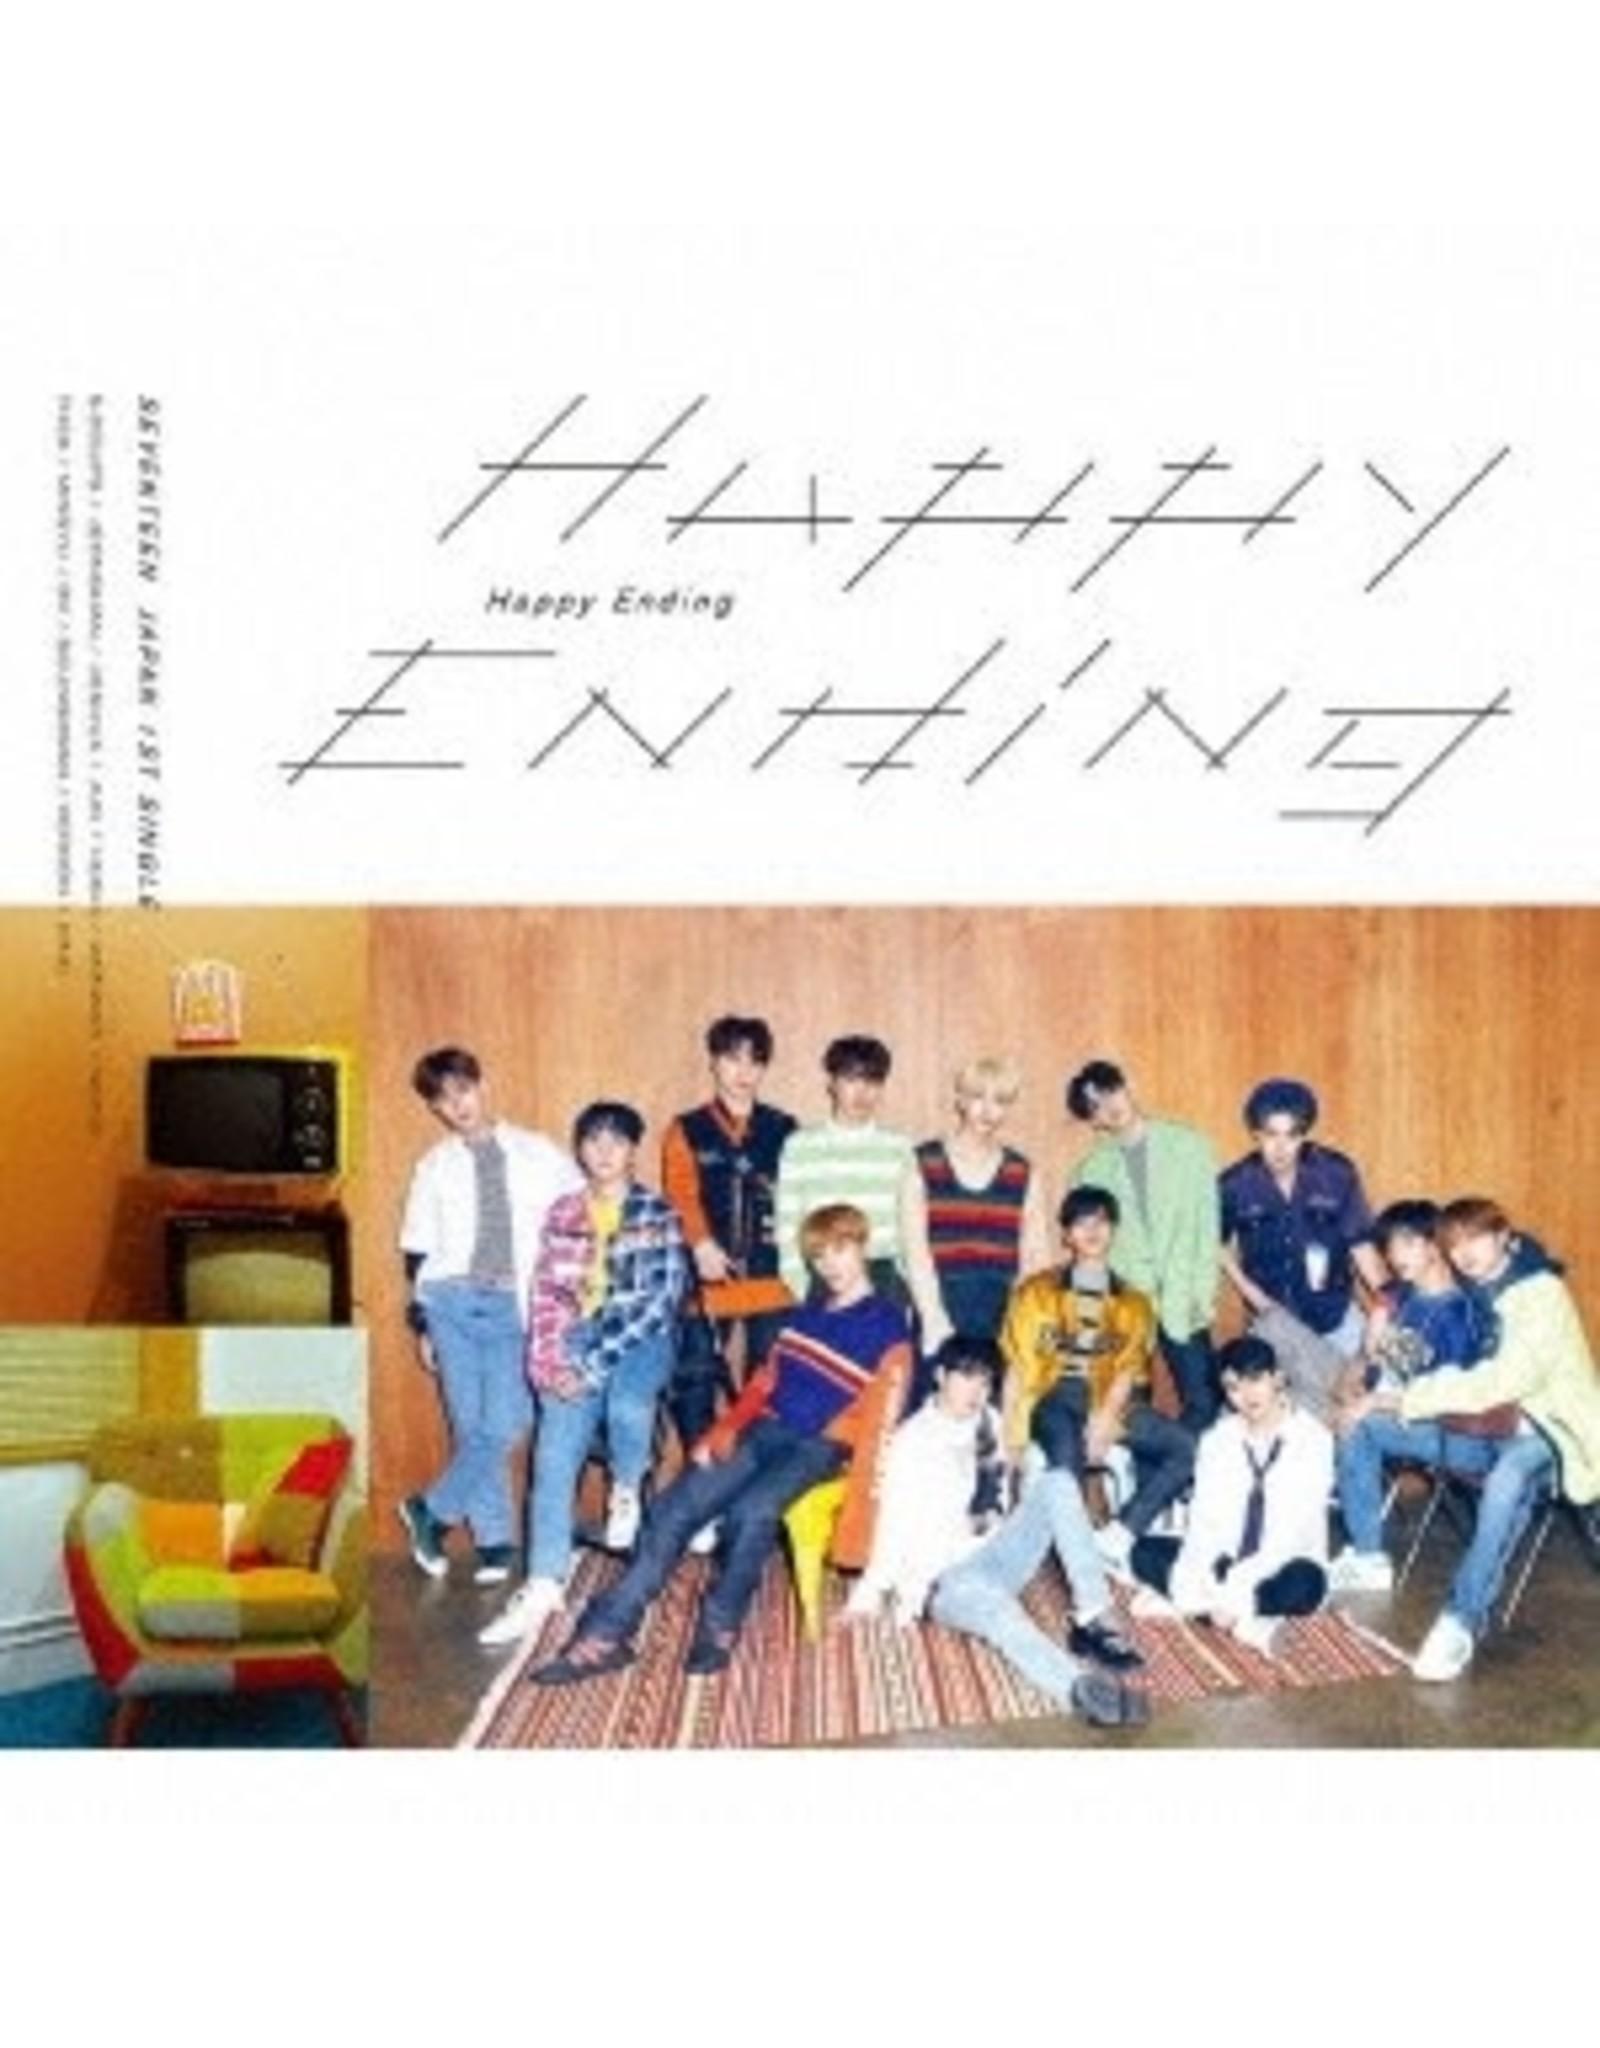 JPT [CD]HAPPY ENDING  [LIMITED-A/CD+36P PHOTOBOOK&CARD(A)/DIGIPACK ]